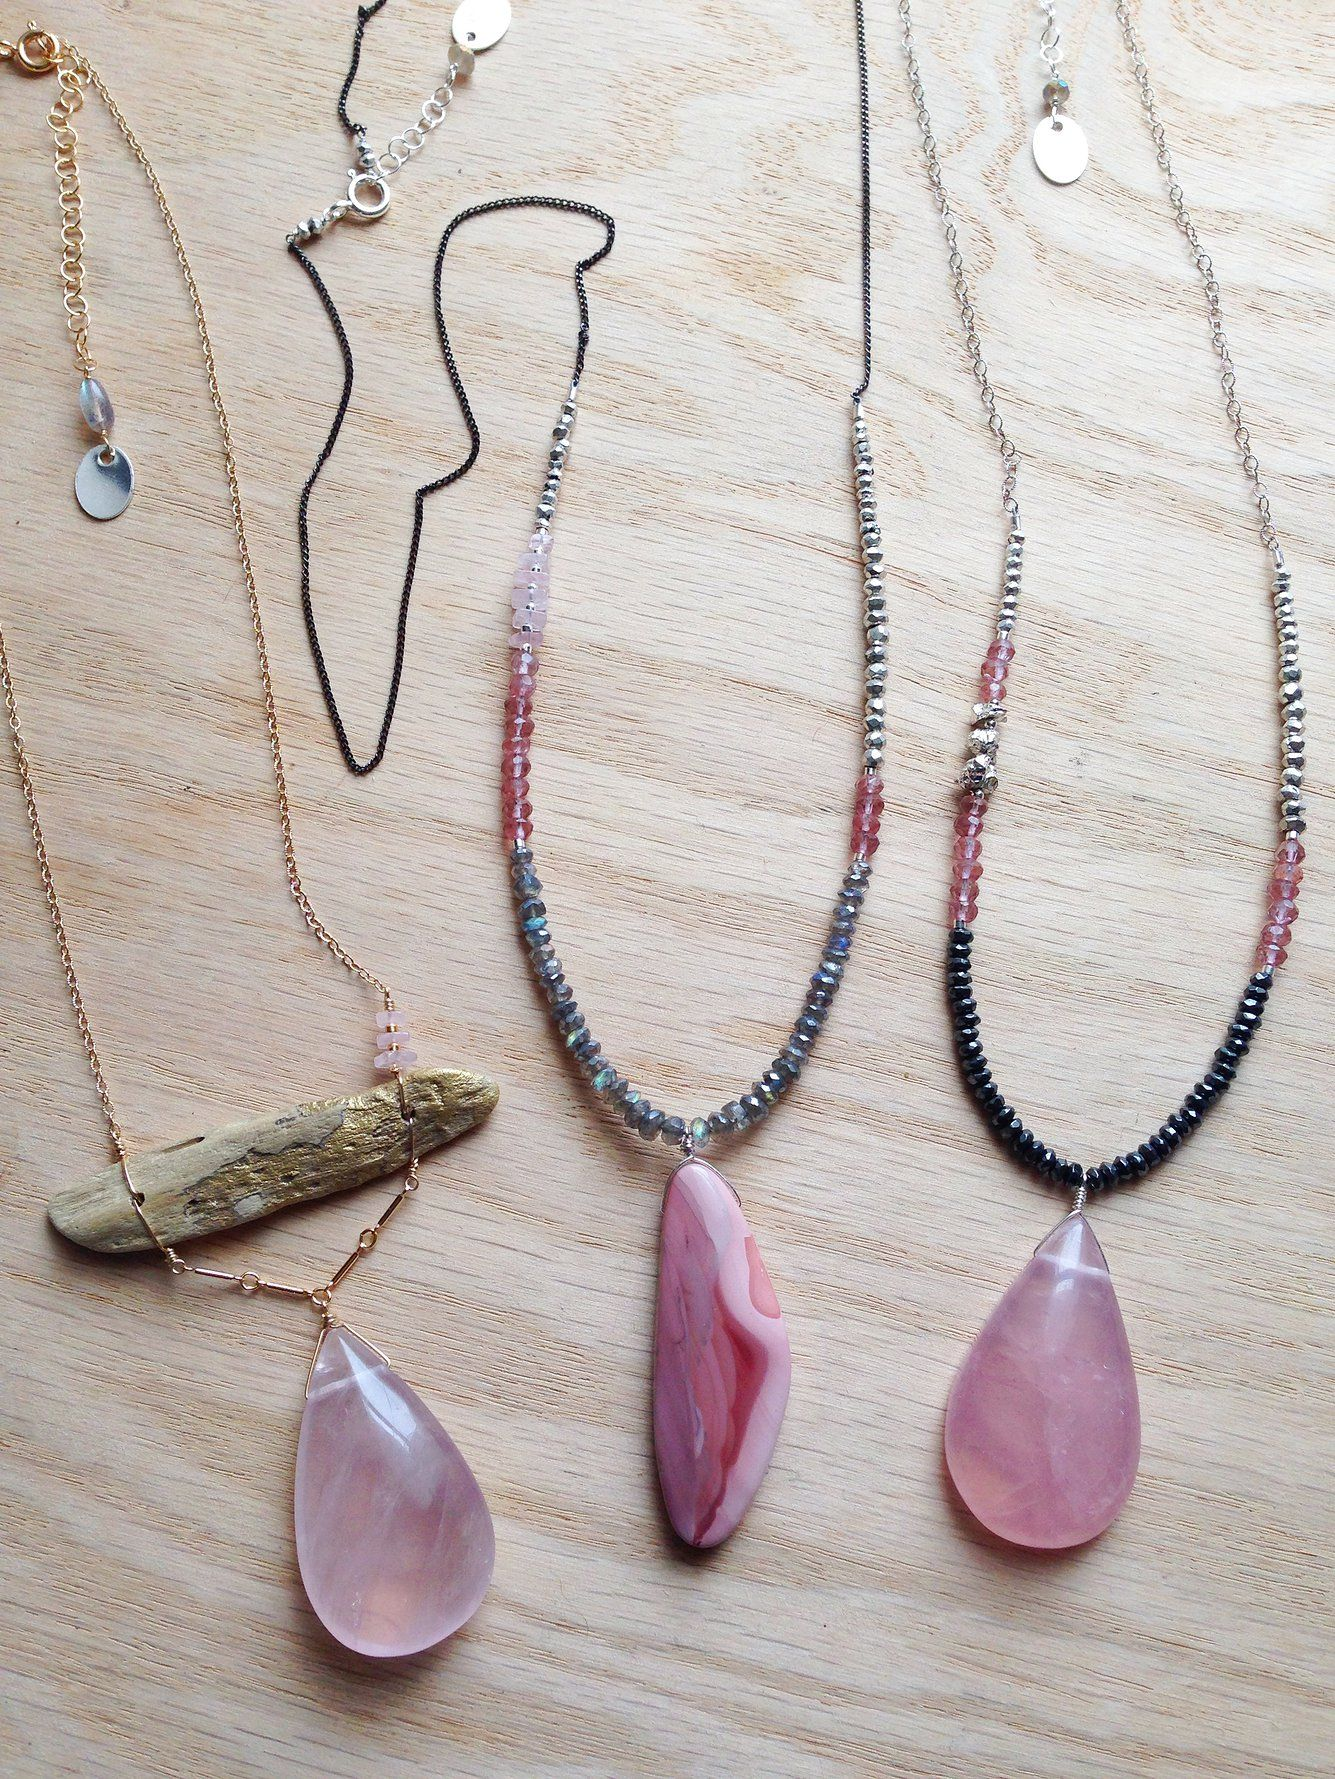 ∆∆∇∇ elementality | unique jewelry + clothing + art | -hush- necklaces